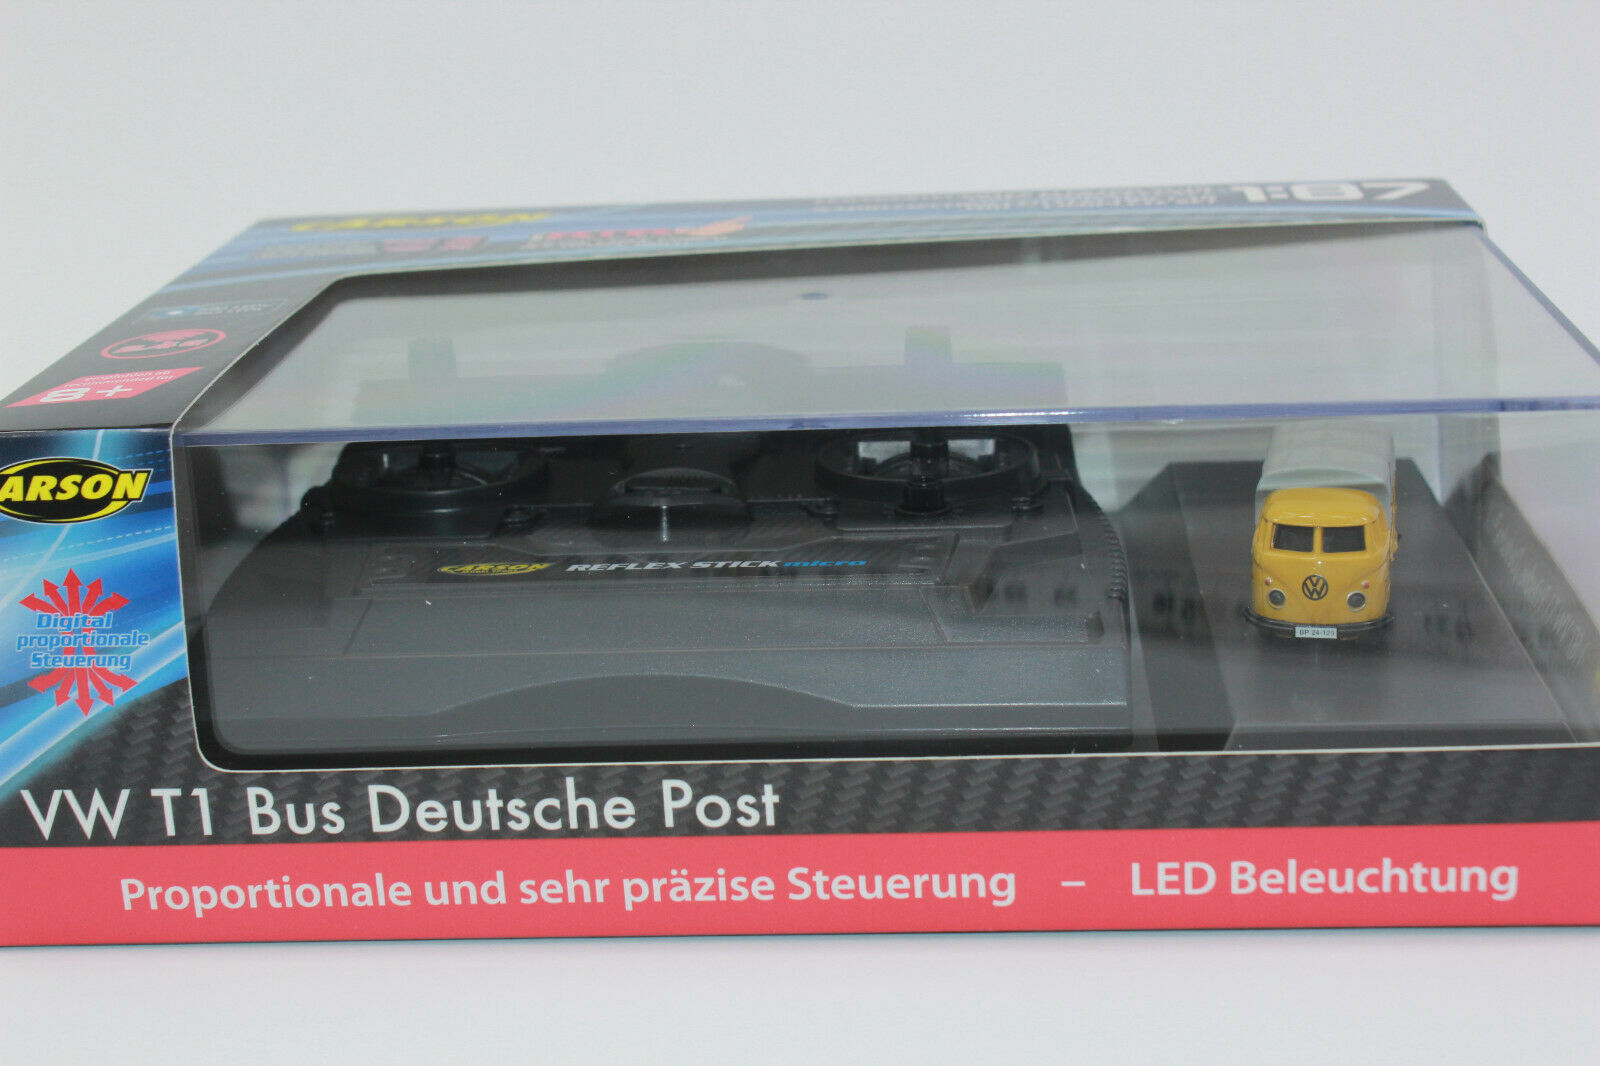 Carson 500504123 VW T1 T1 T1 Bus Deutsche post 0.0847oz 1 87 100% Rtr Nip 1e424d